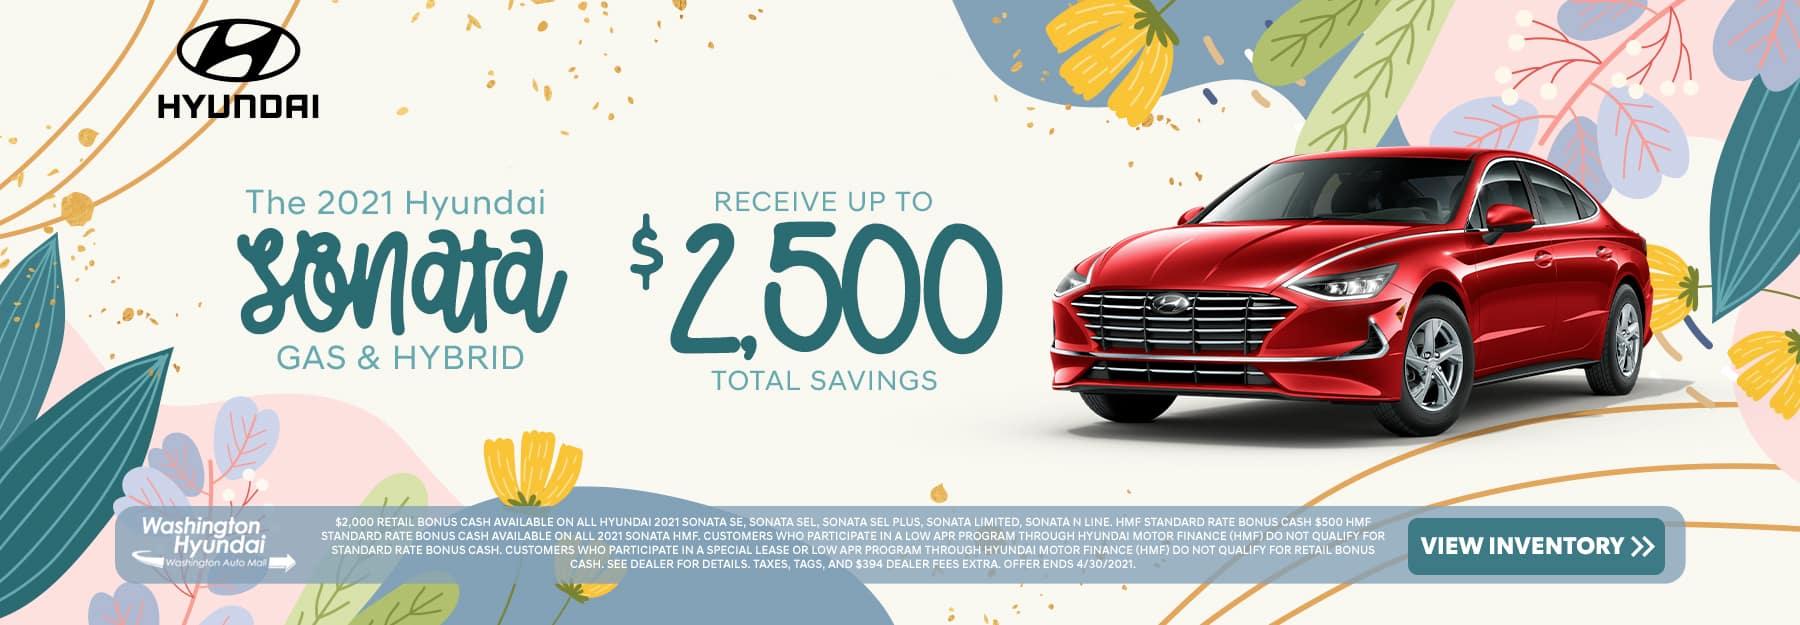 The 2021 Hyundai Sonata Gas & Hybrid - save up to $2,500!